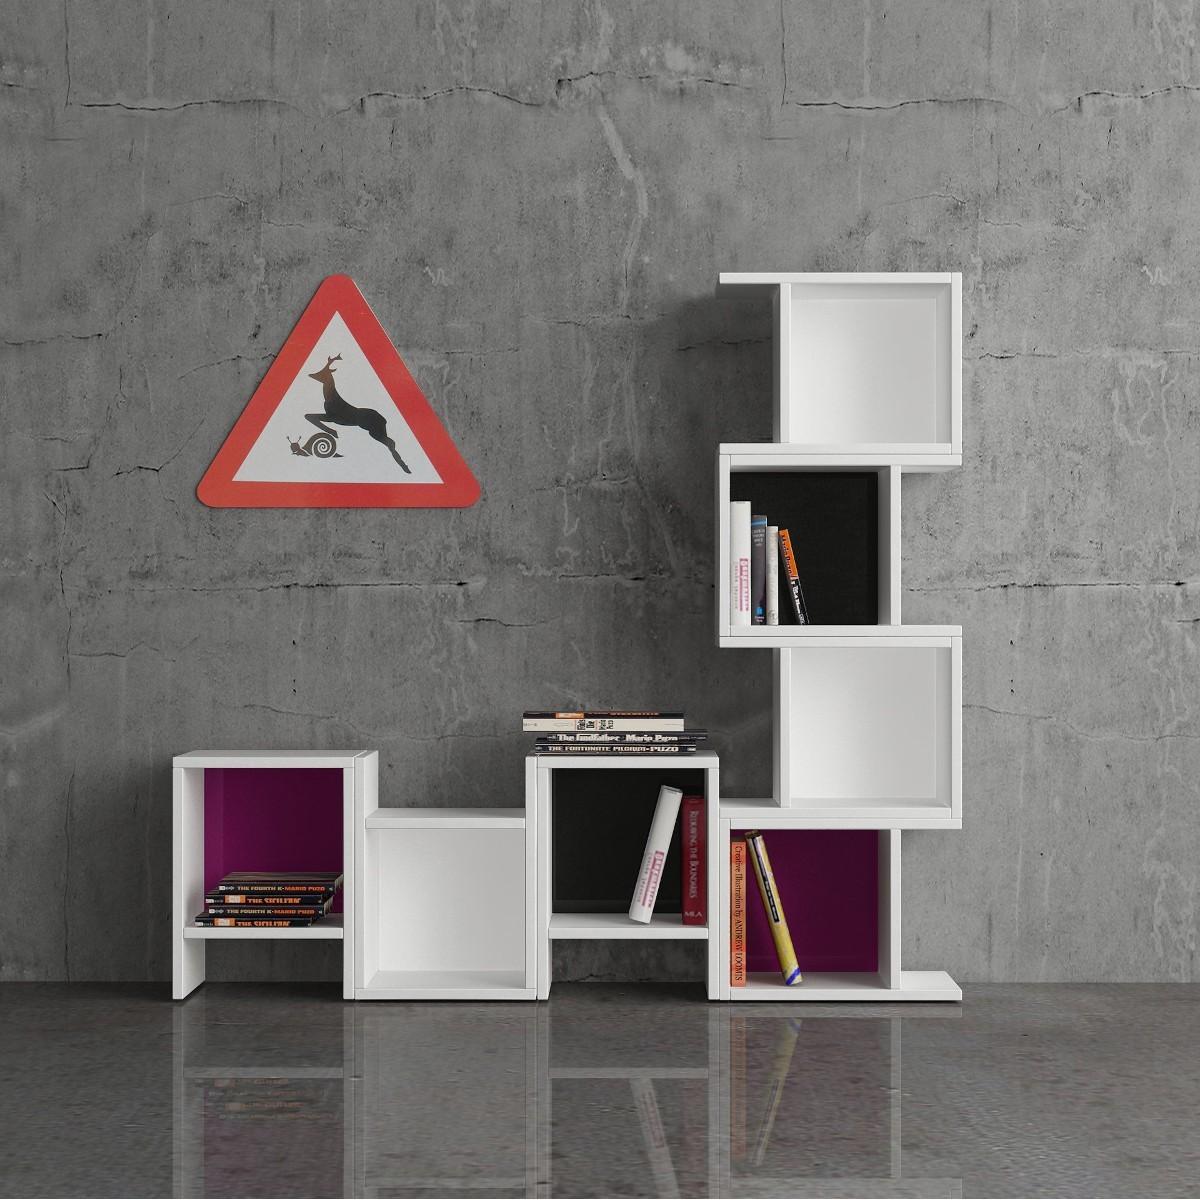 Modularmix libreria componibile a cubi design moderno for Libreria angolare componibile